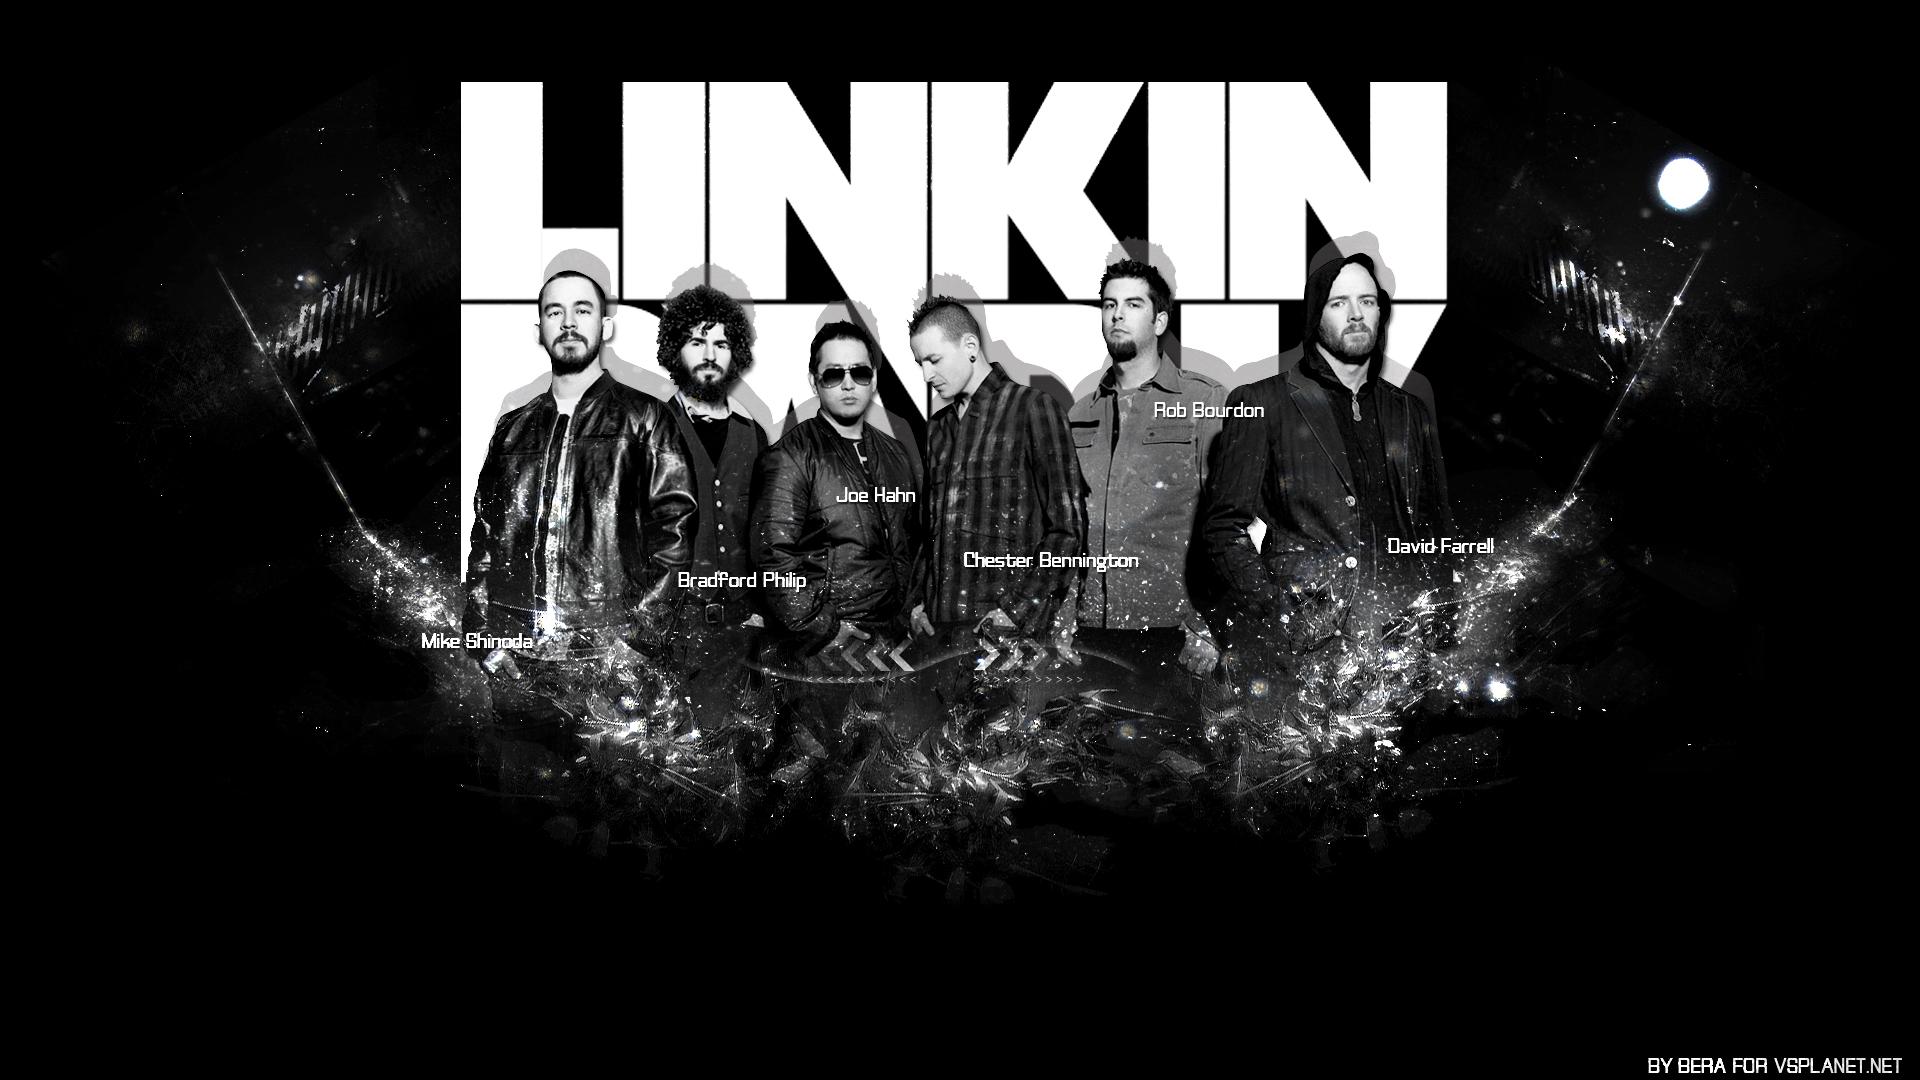 Linkin Park Wallpaper 1920x1080 43582